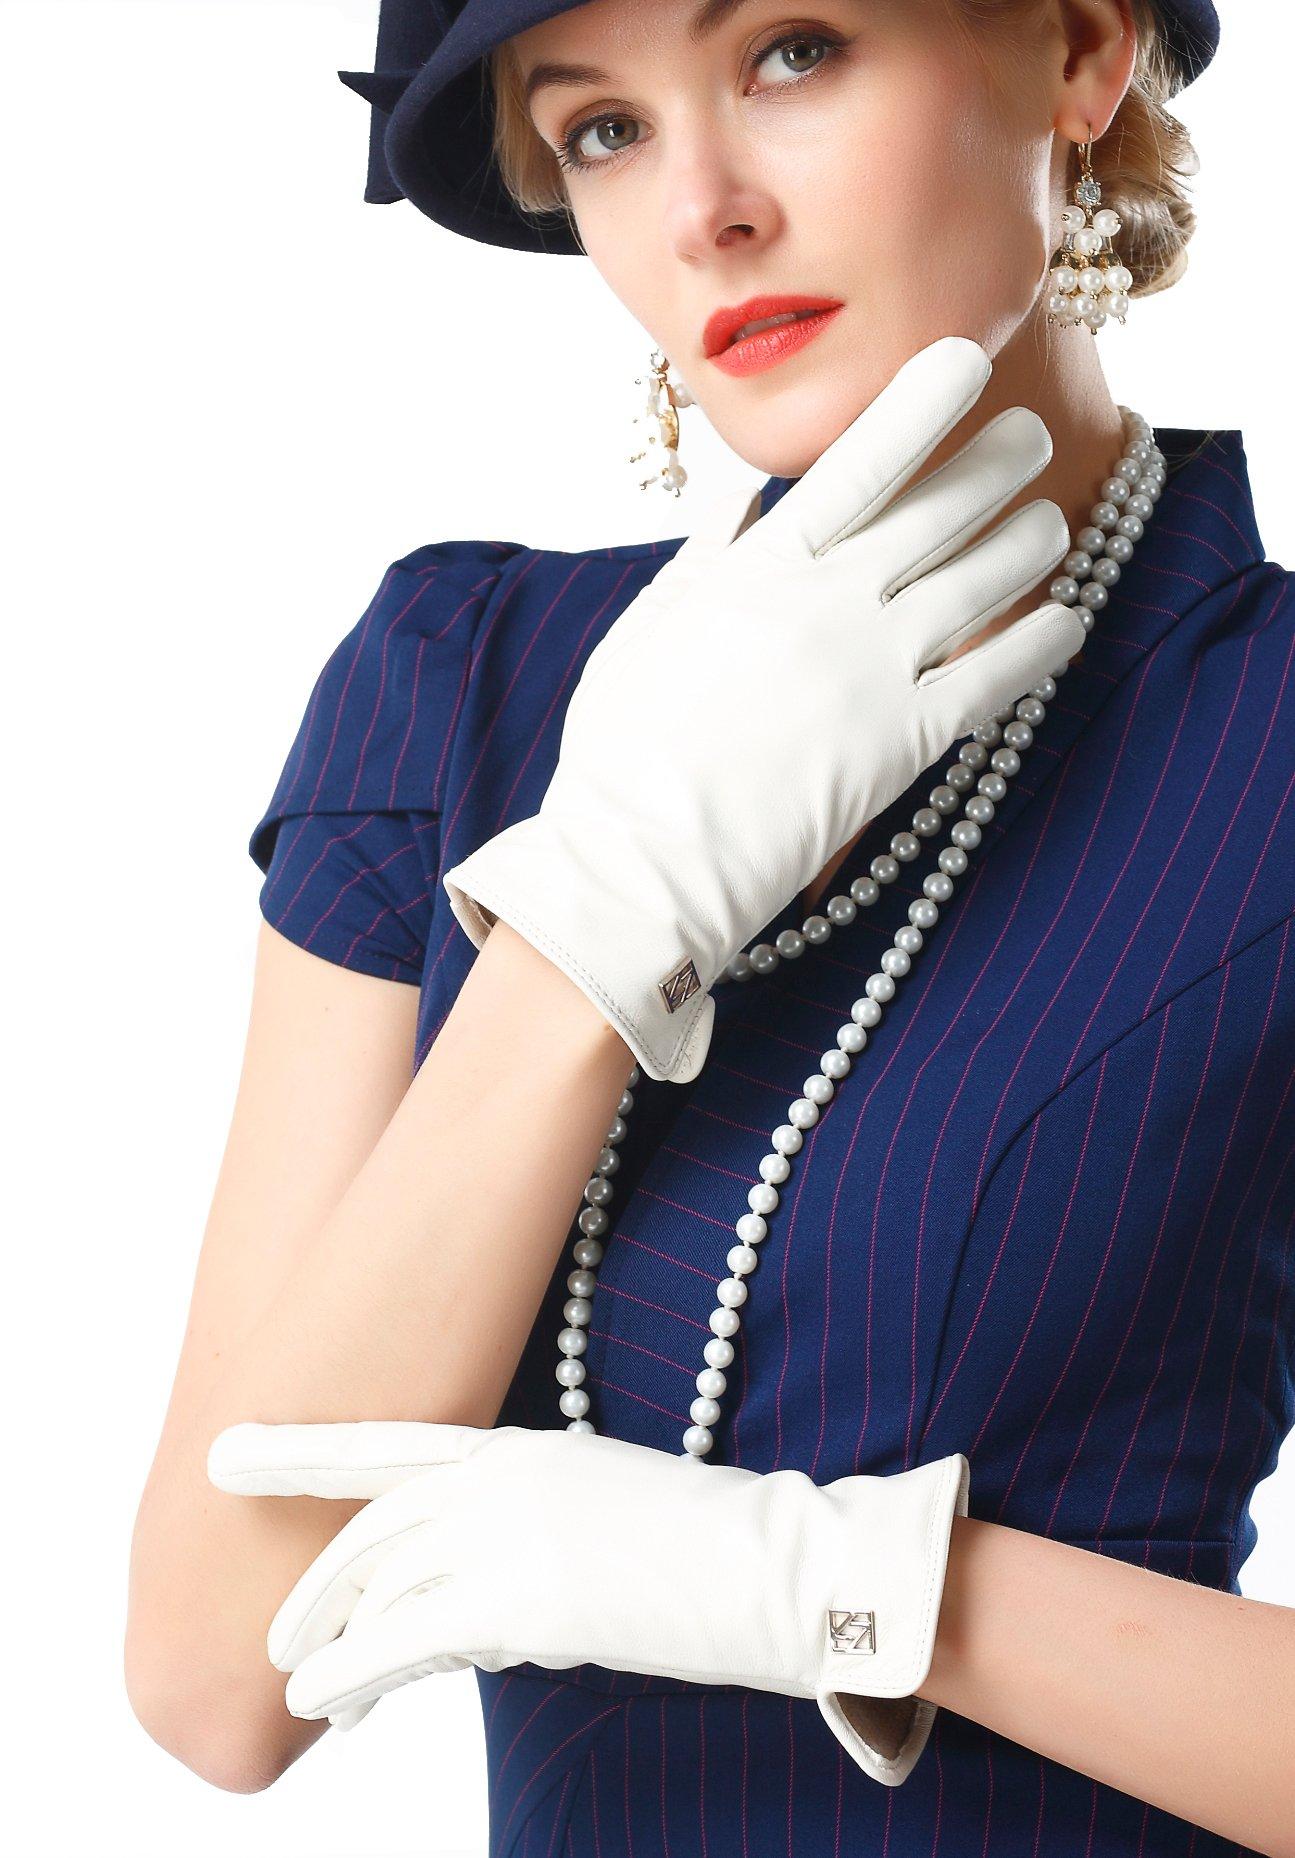 NappaNovum Women's Classic Italian Nappa Leather Gloves Lambskin Winter Comfort Lining Fashion Gloves (Touchscreen or Non-Touchscreen) (L, White)